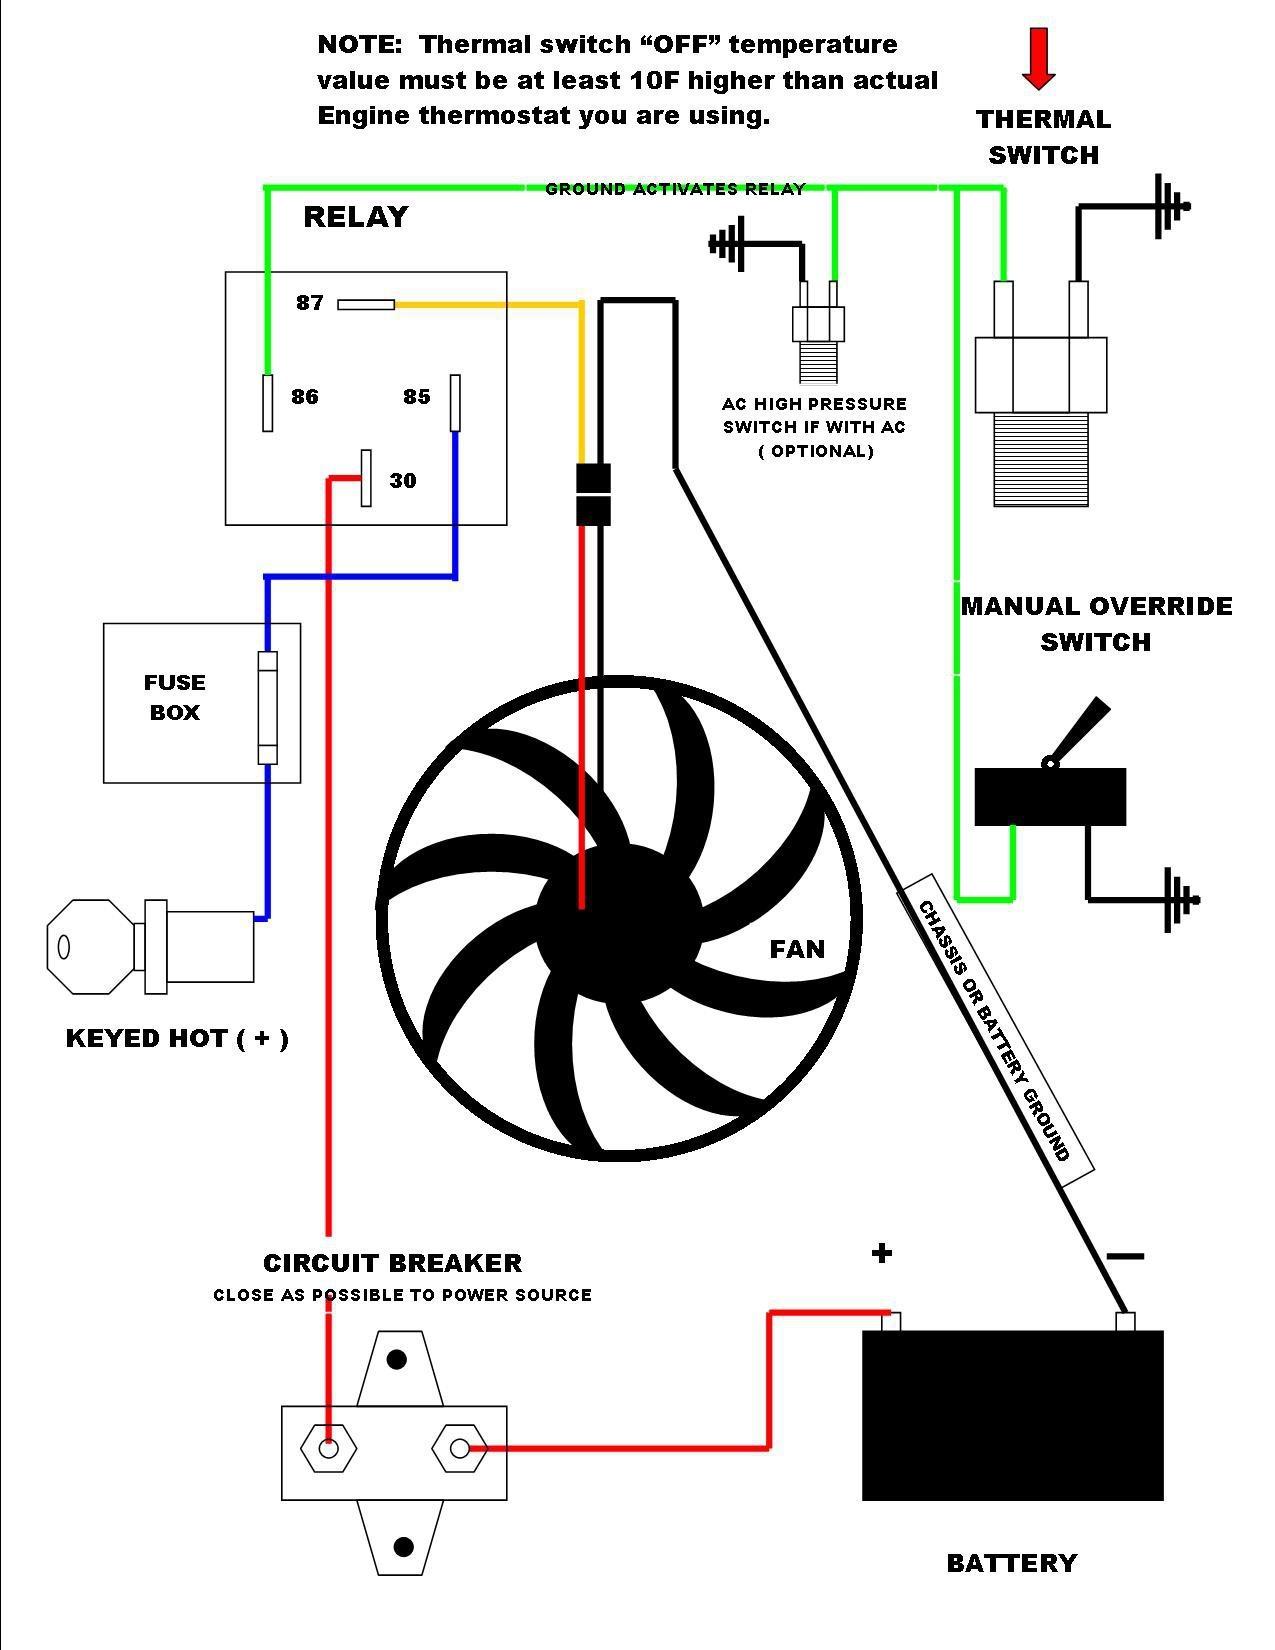 90370 relay schematic wiring diagram trusted wiring diagram u2022 rh soulmatestyle co  pilz pnoz 11 safety relay wiring diagram